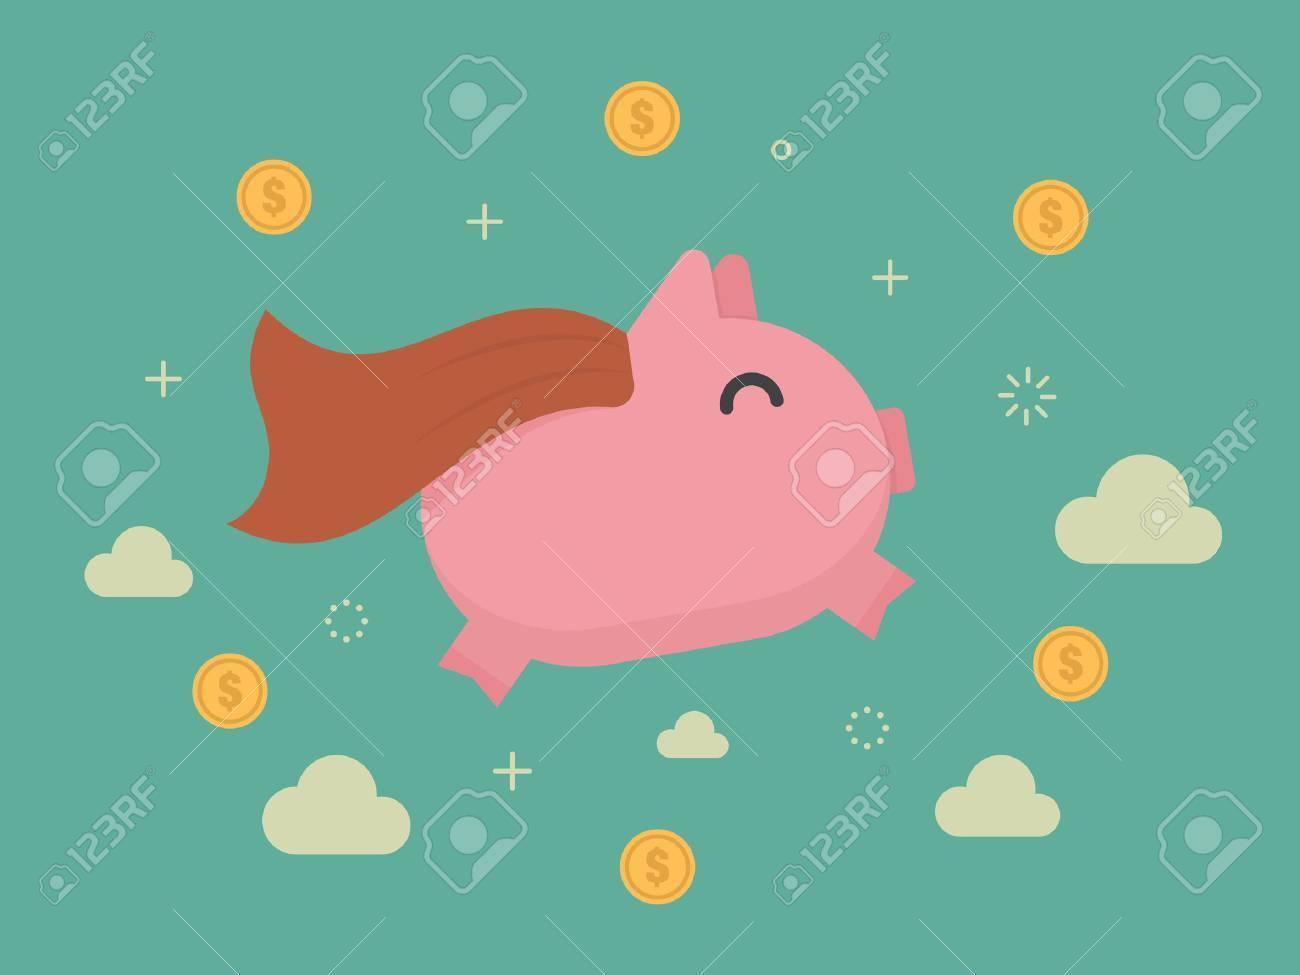 Super piggy bank. Business concept cartoon illustration - 55512458